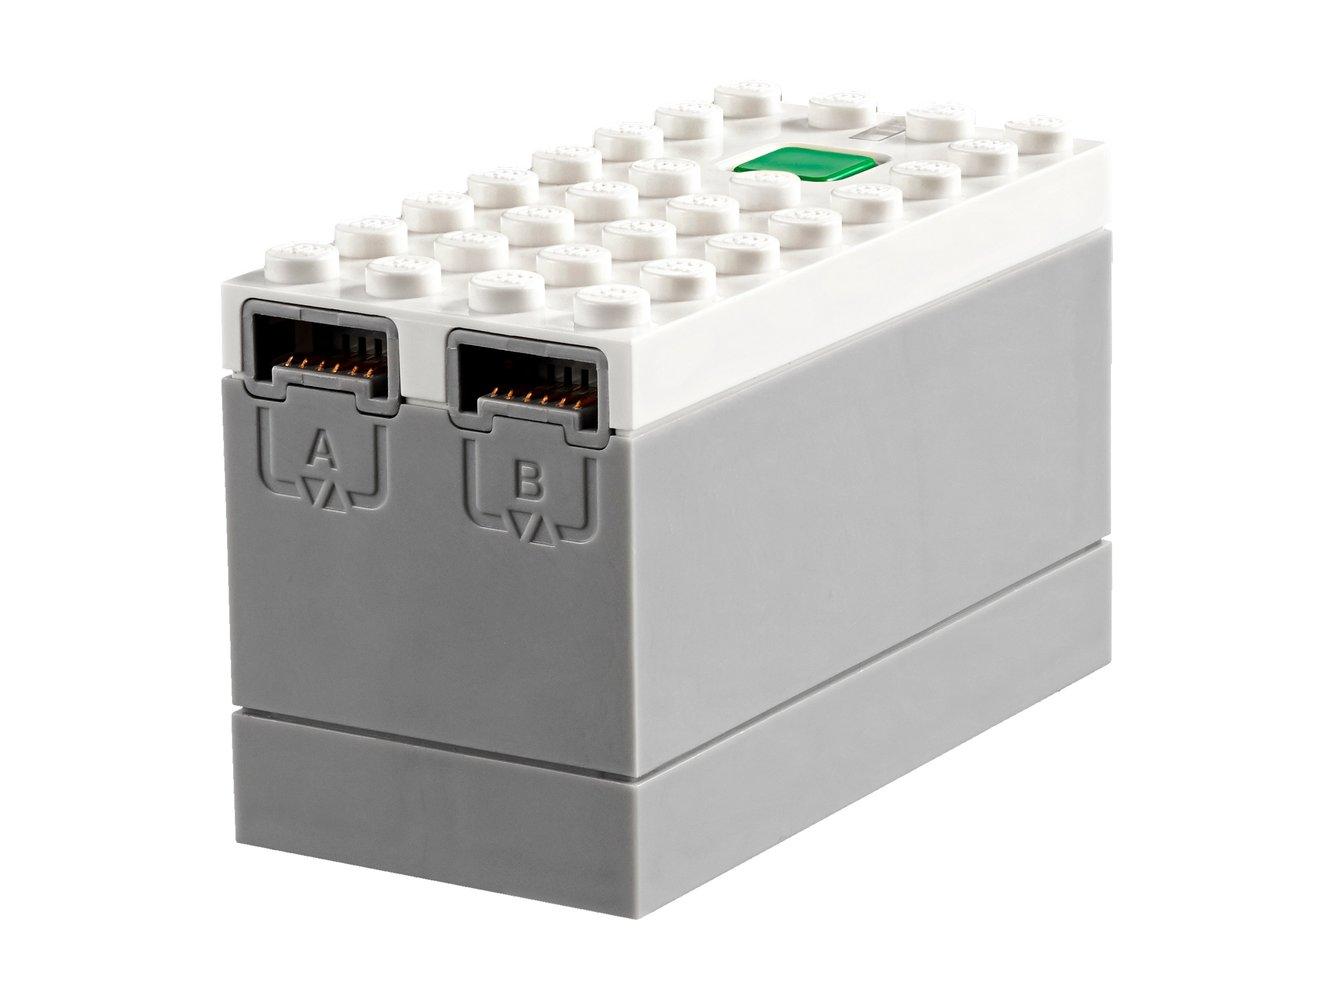 Hub (Battery Box)